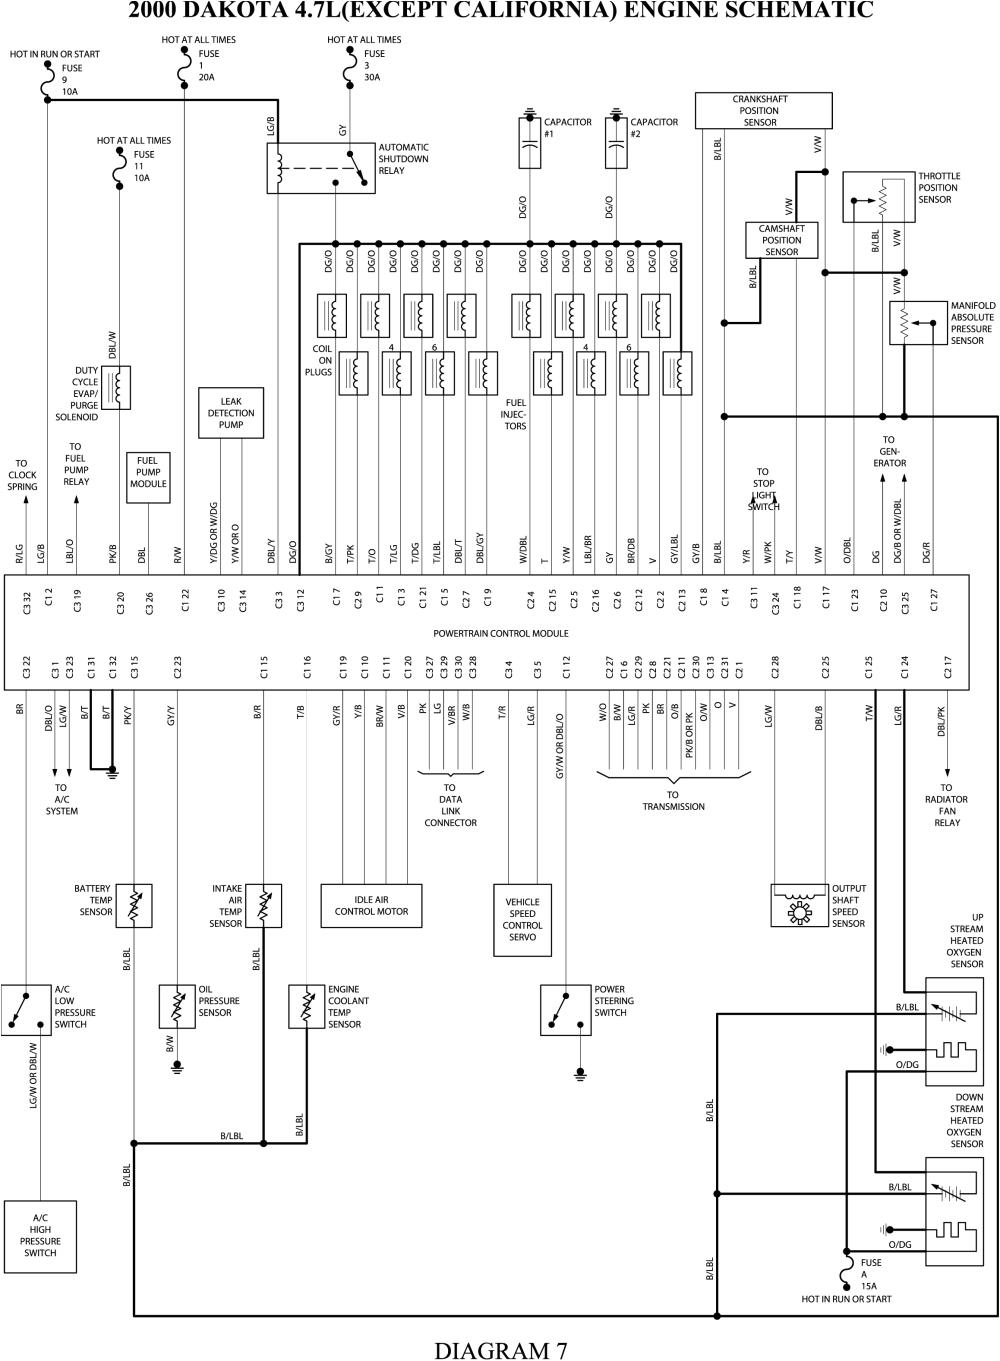 repair guides wiring diagrams wiring diagrams autozone com 1999 dodge durango wiring schematics 1999 durango wiring schematic